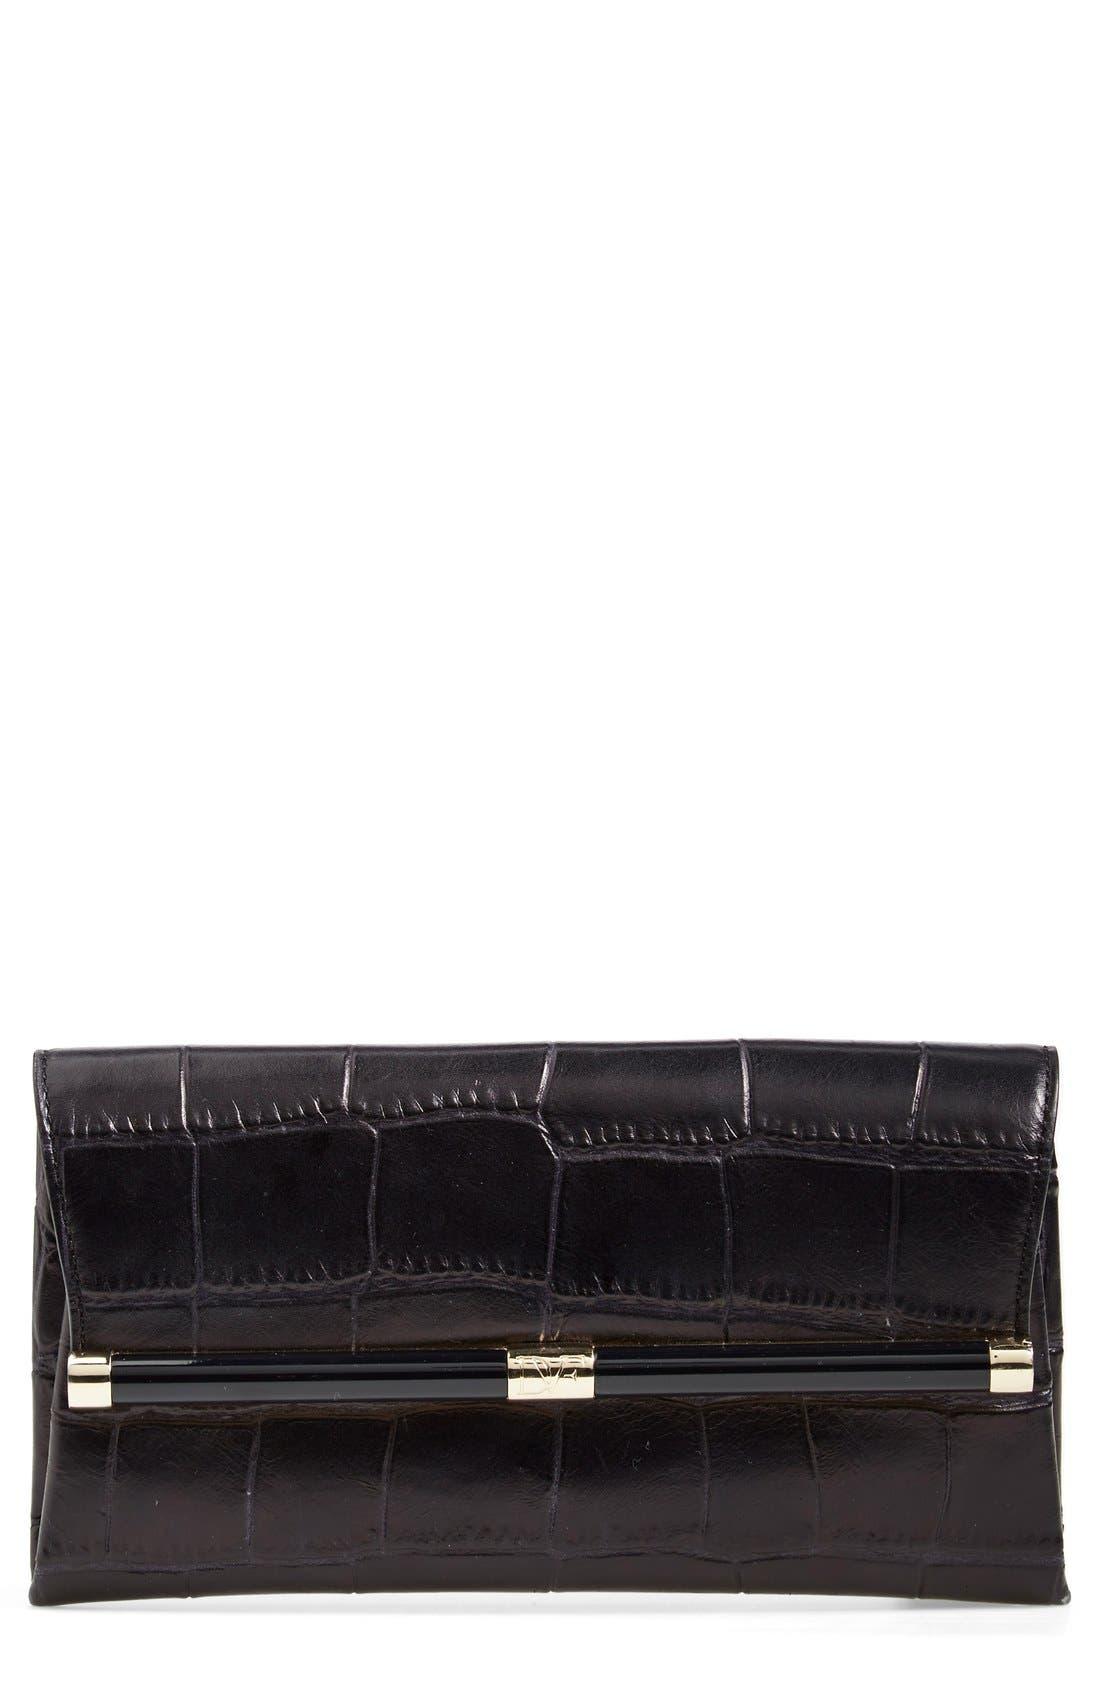 Alternate Image 1 Selected - Diane von Furstenberg '440' Croc-Embossed Leather Envelope Clutch